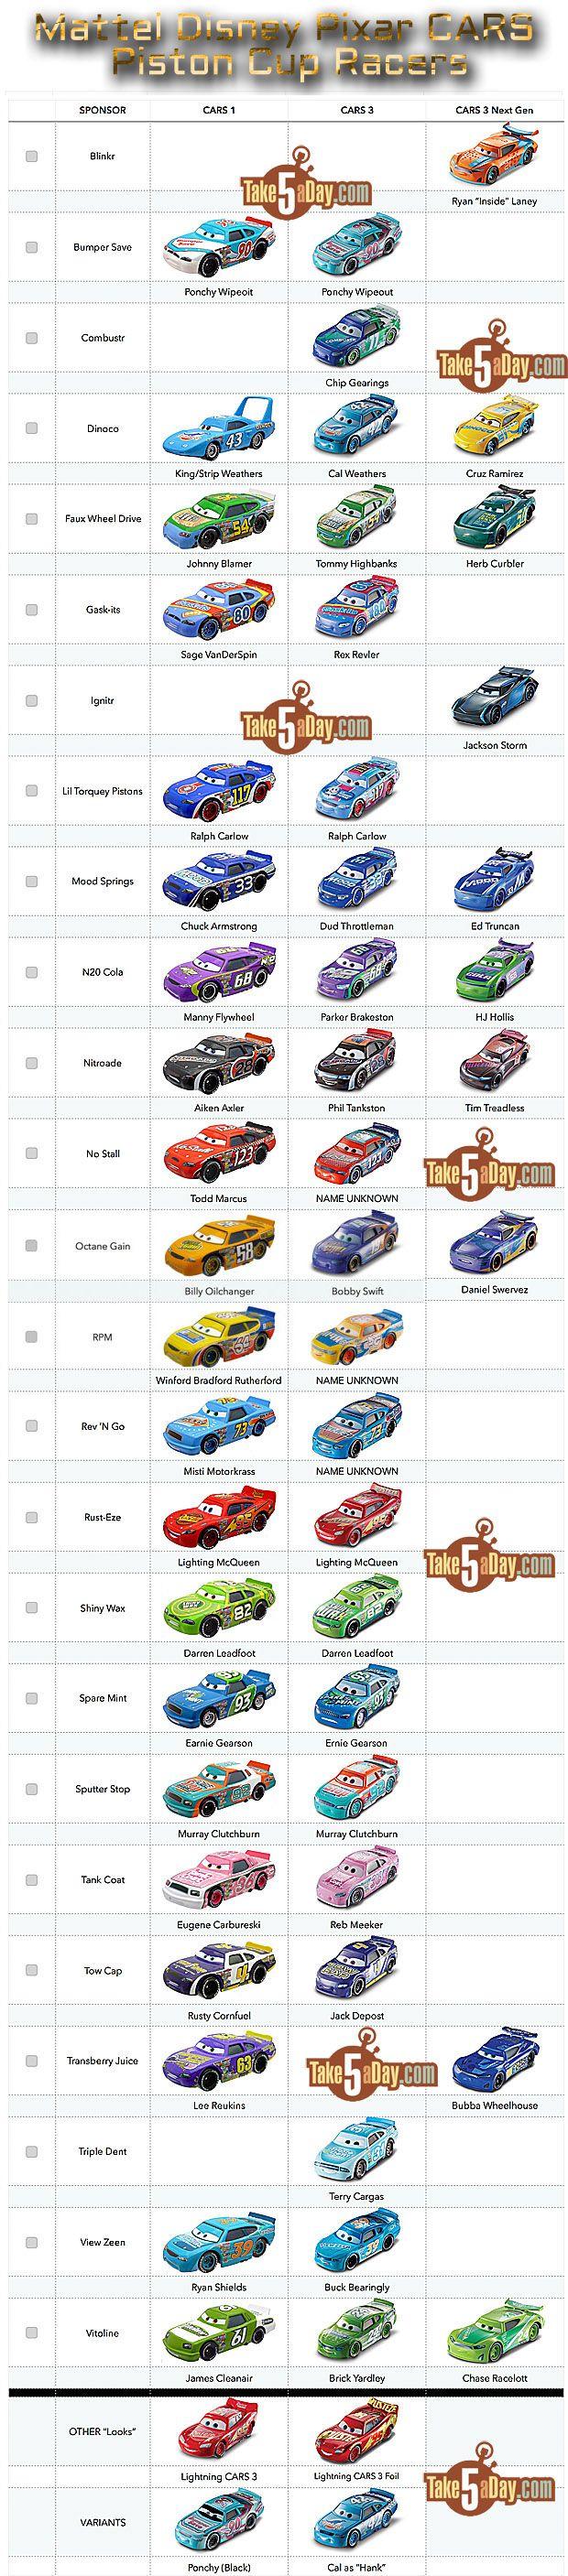 Mattel Disney Pixar Cars 3 Piston Cup Racers Cars 1 To Cars 3